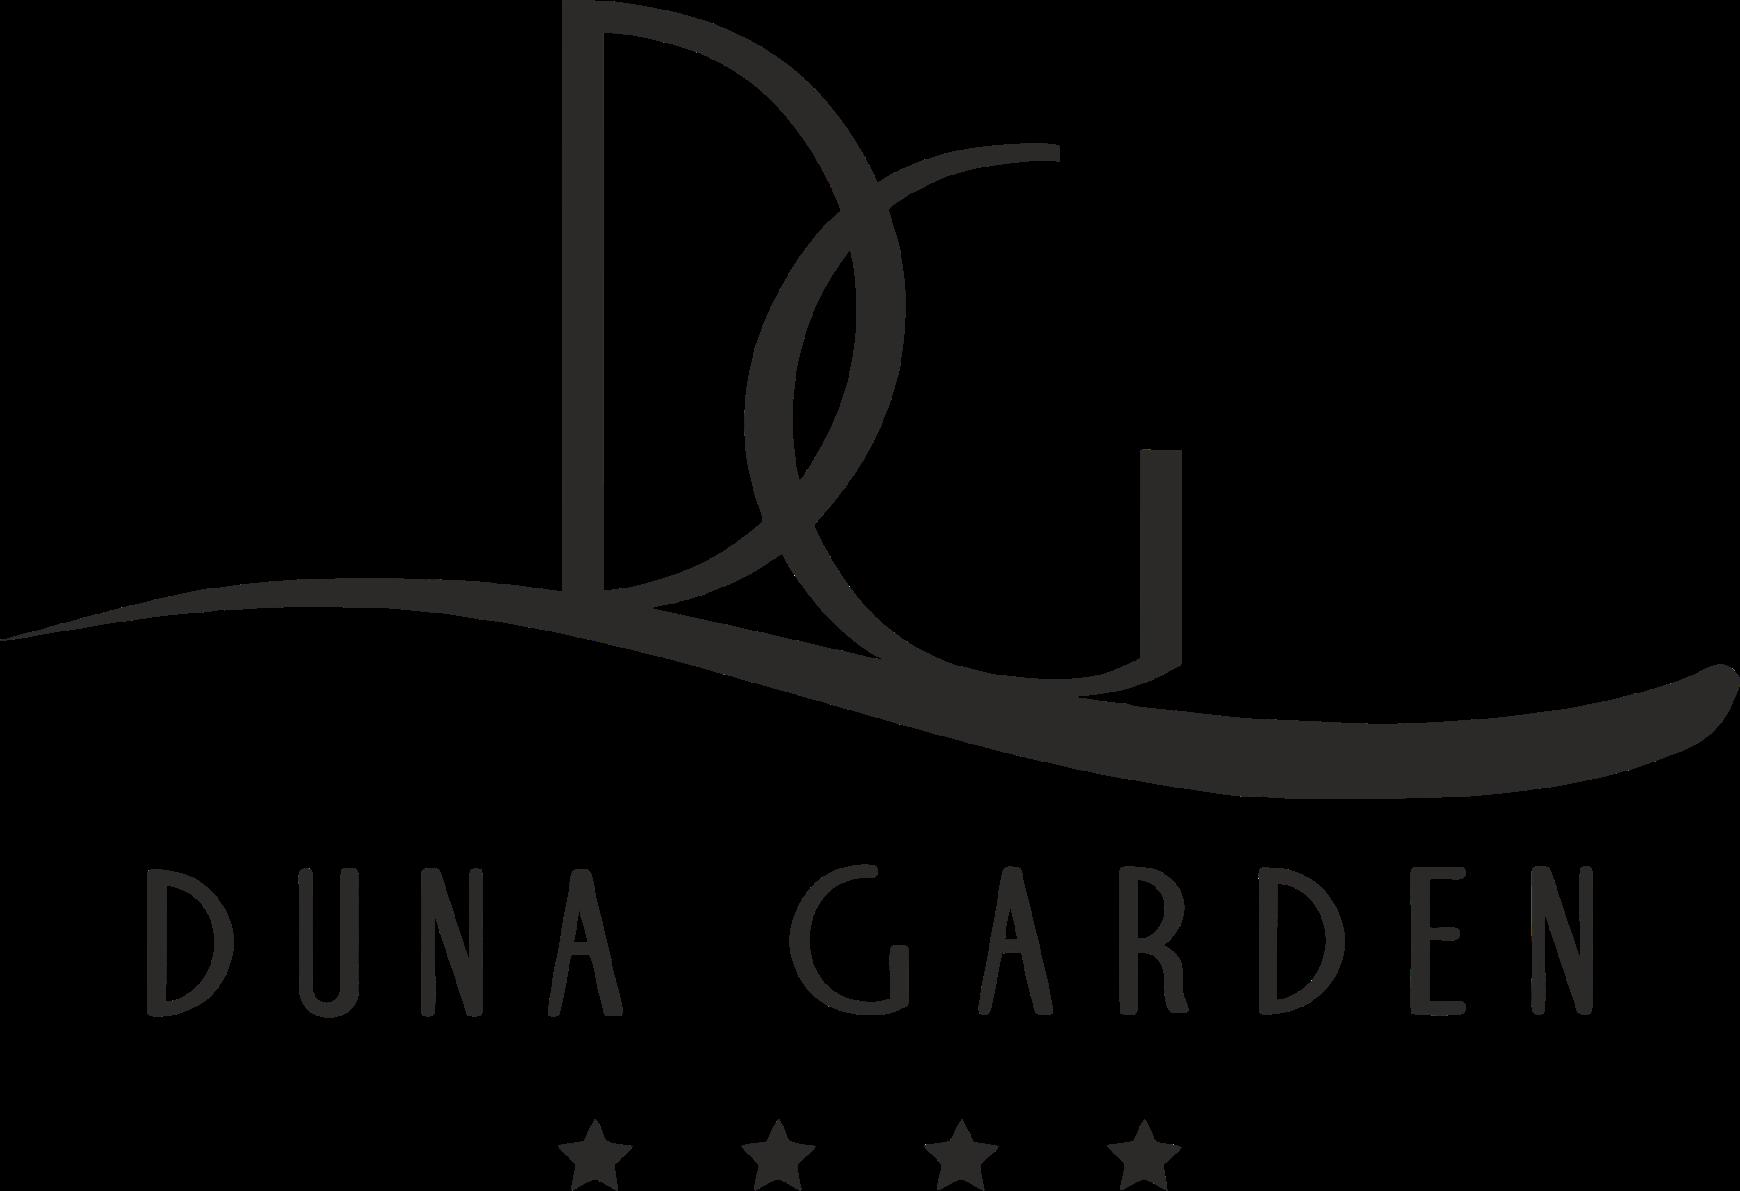 Duna Garden Budapest